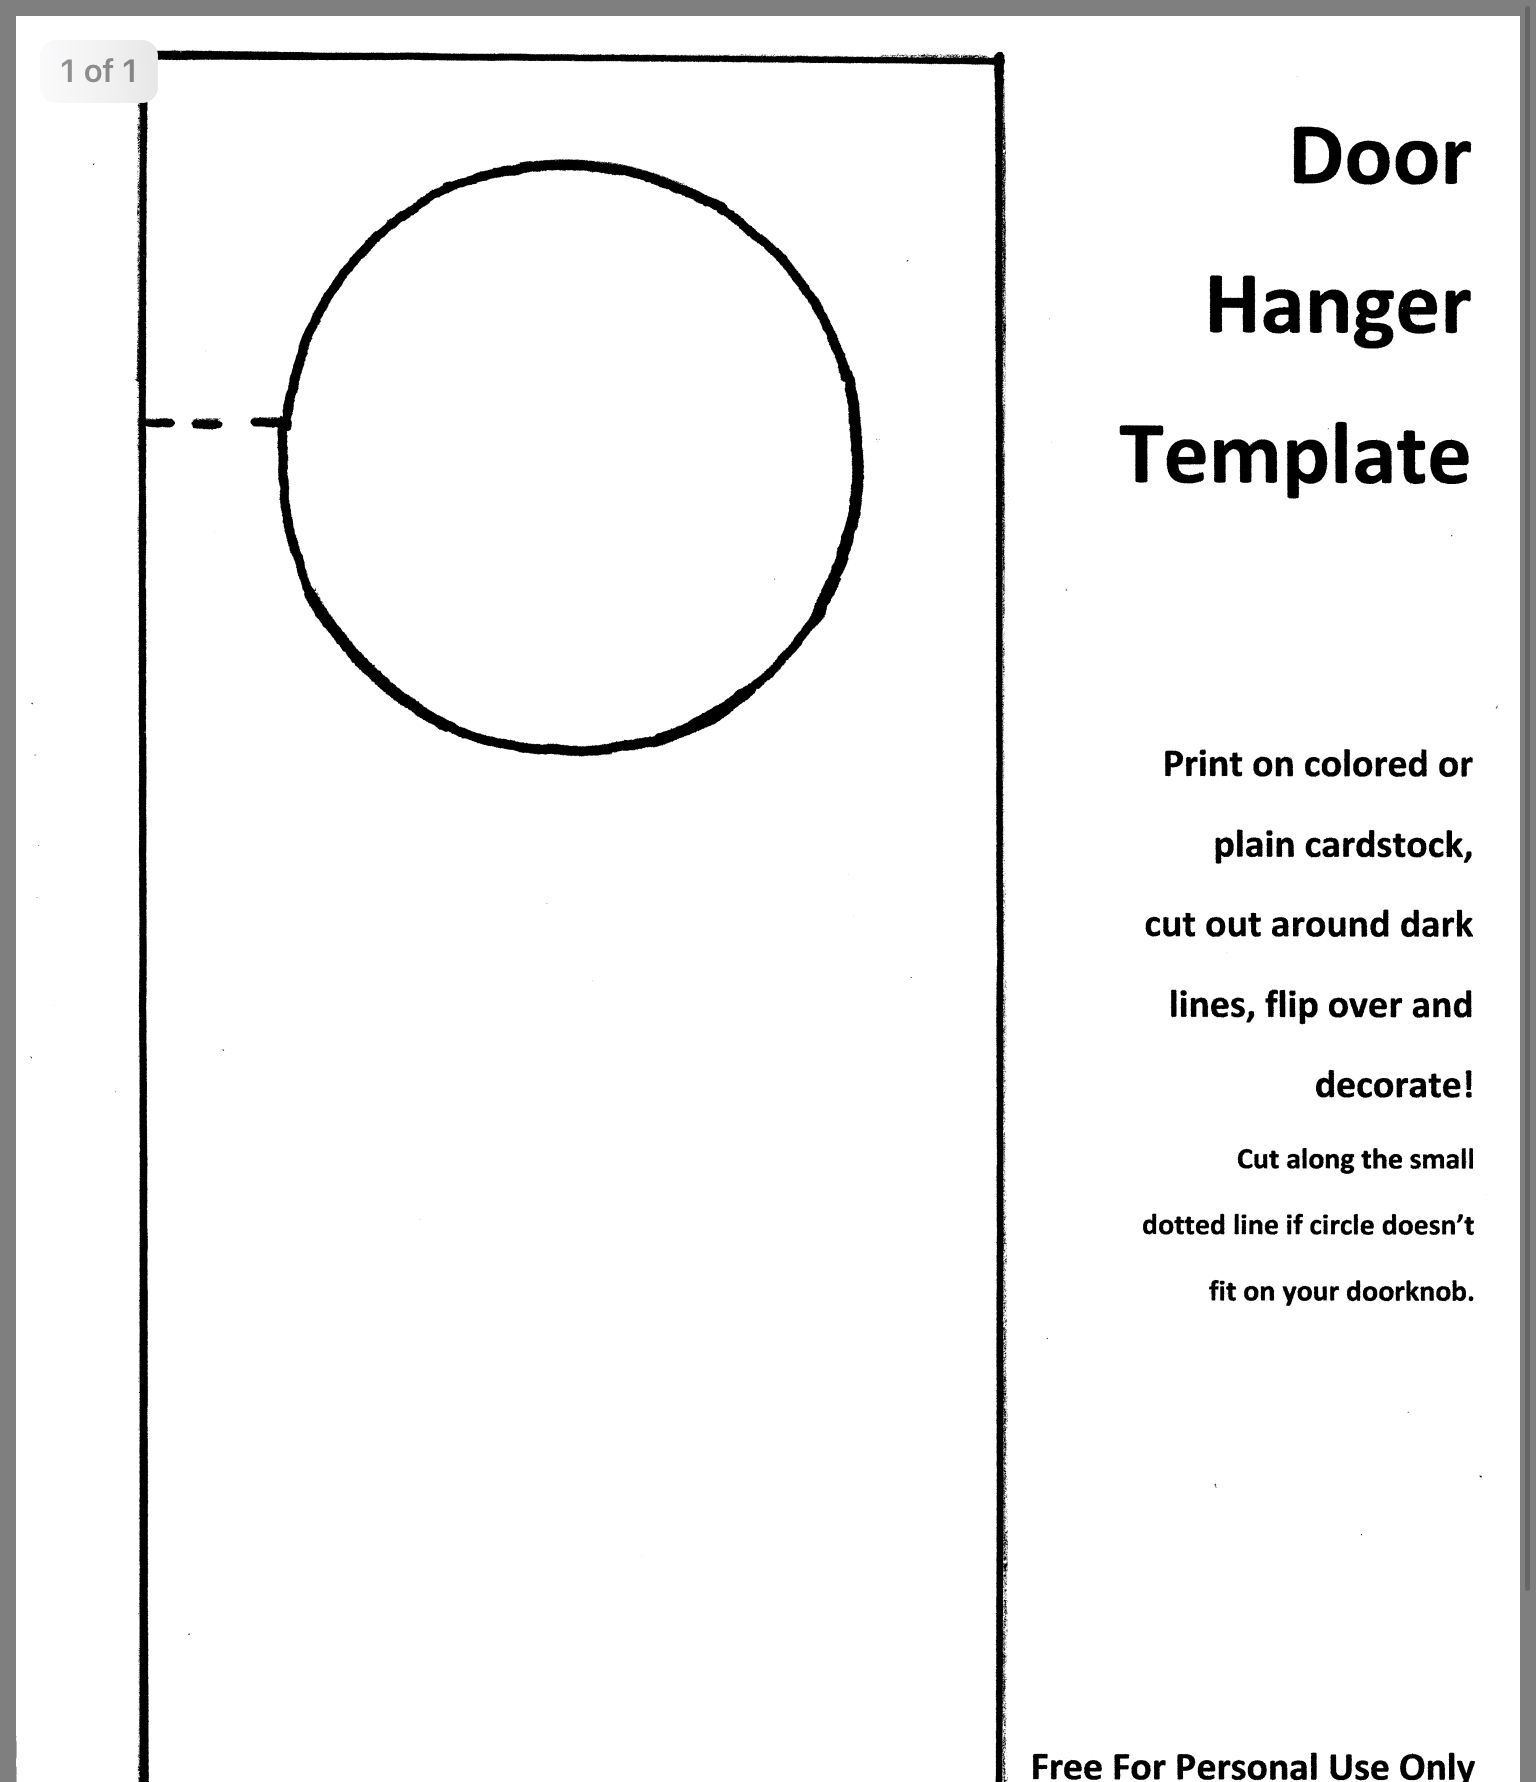 002 Astounding Blank Door Hanger Template Free Design Full